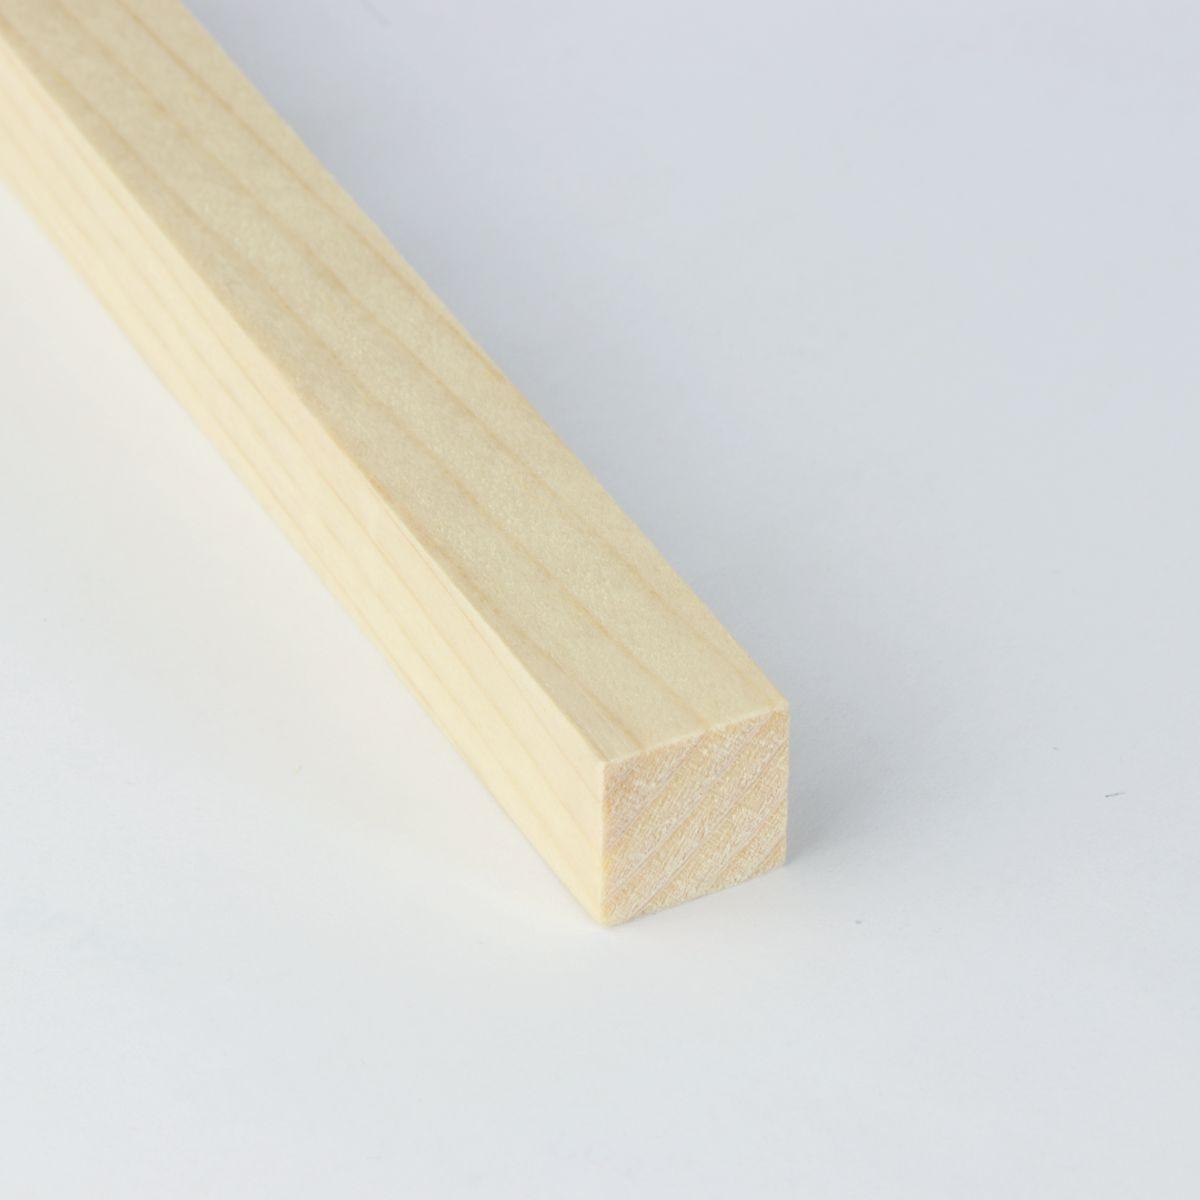 LESENE LETVE SMREKA 15x15mm 2M